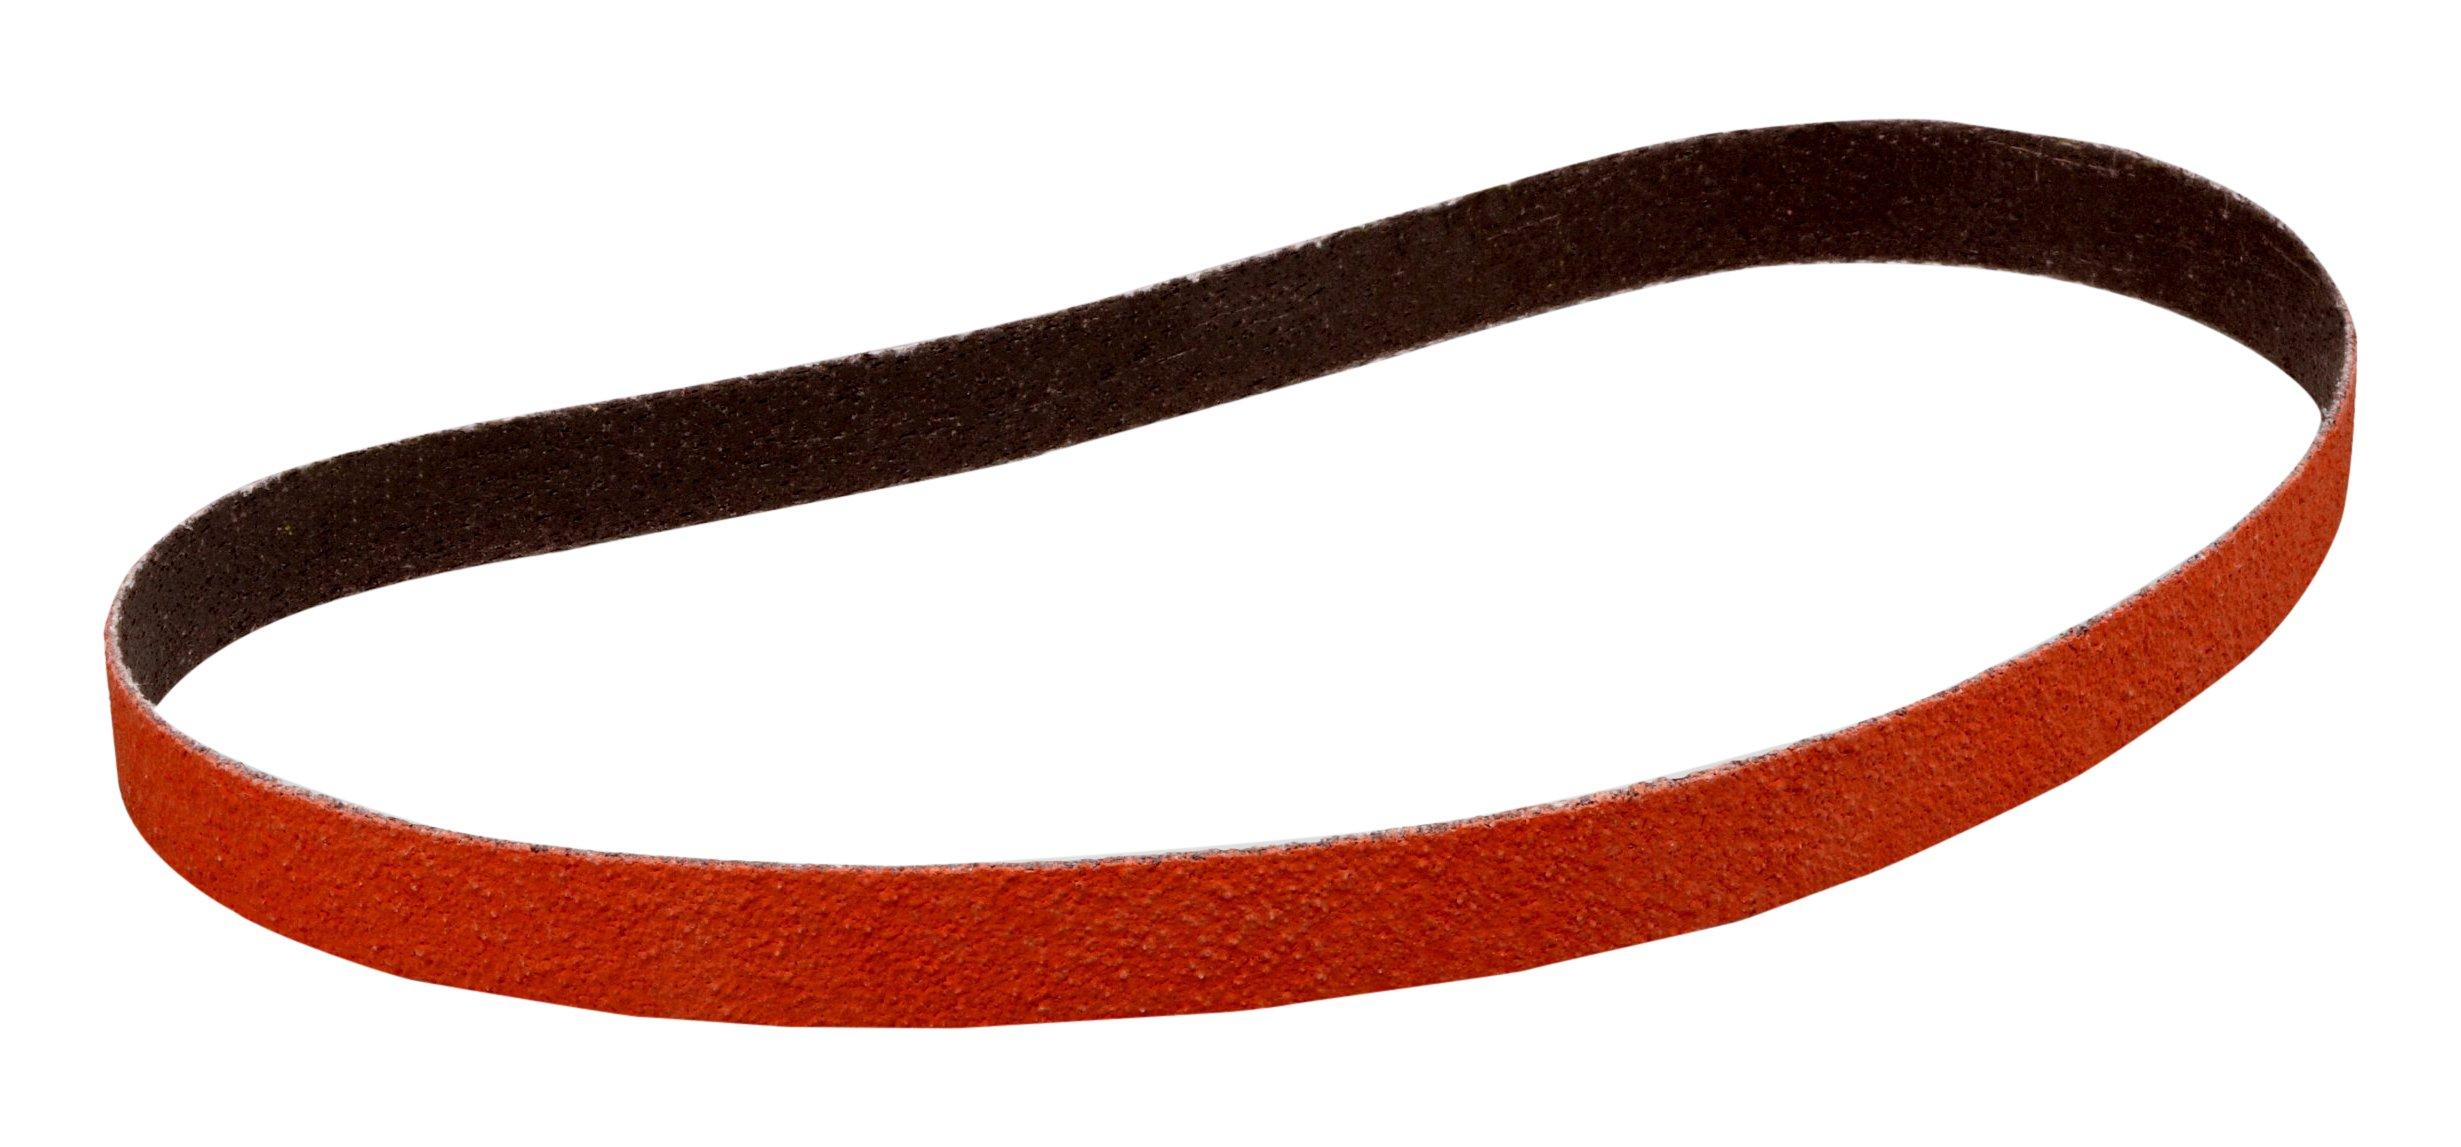 Cubitron II 64303-case 3M Cloth Belt 984F, 2'' x 72'' 50+ YF-Weight (Pack of 50)